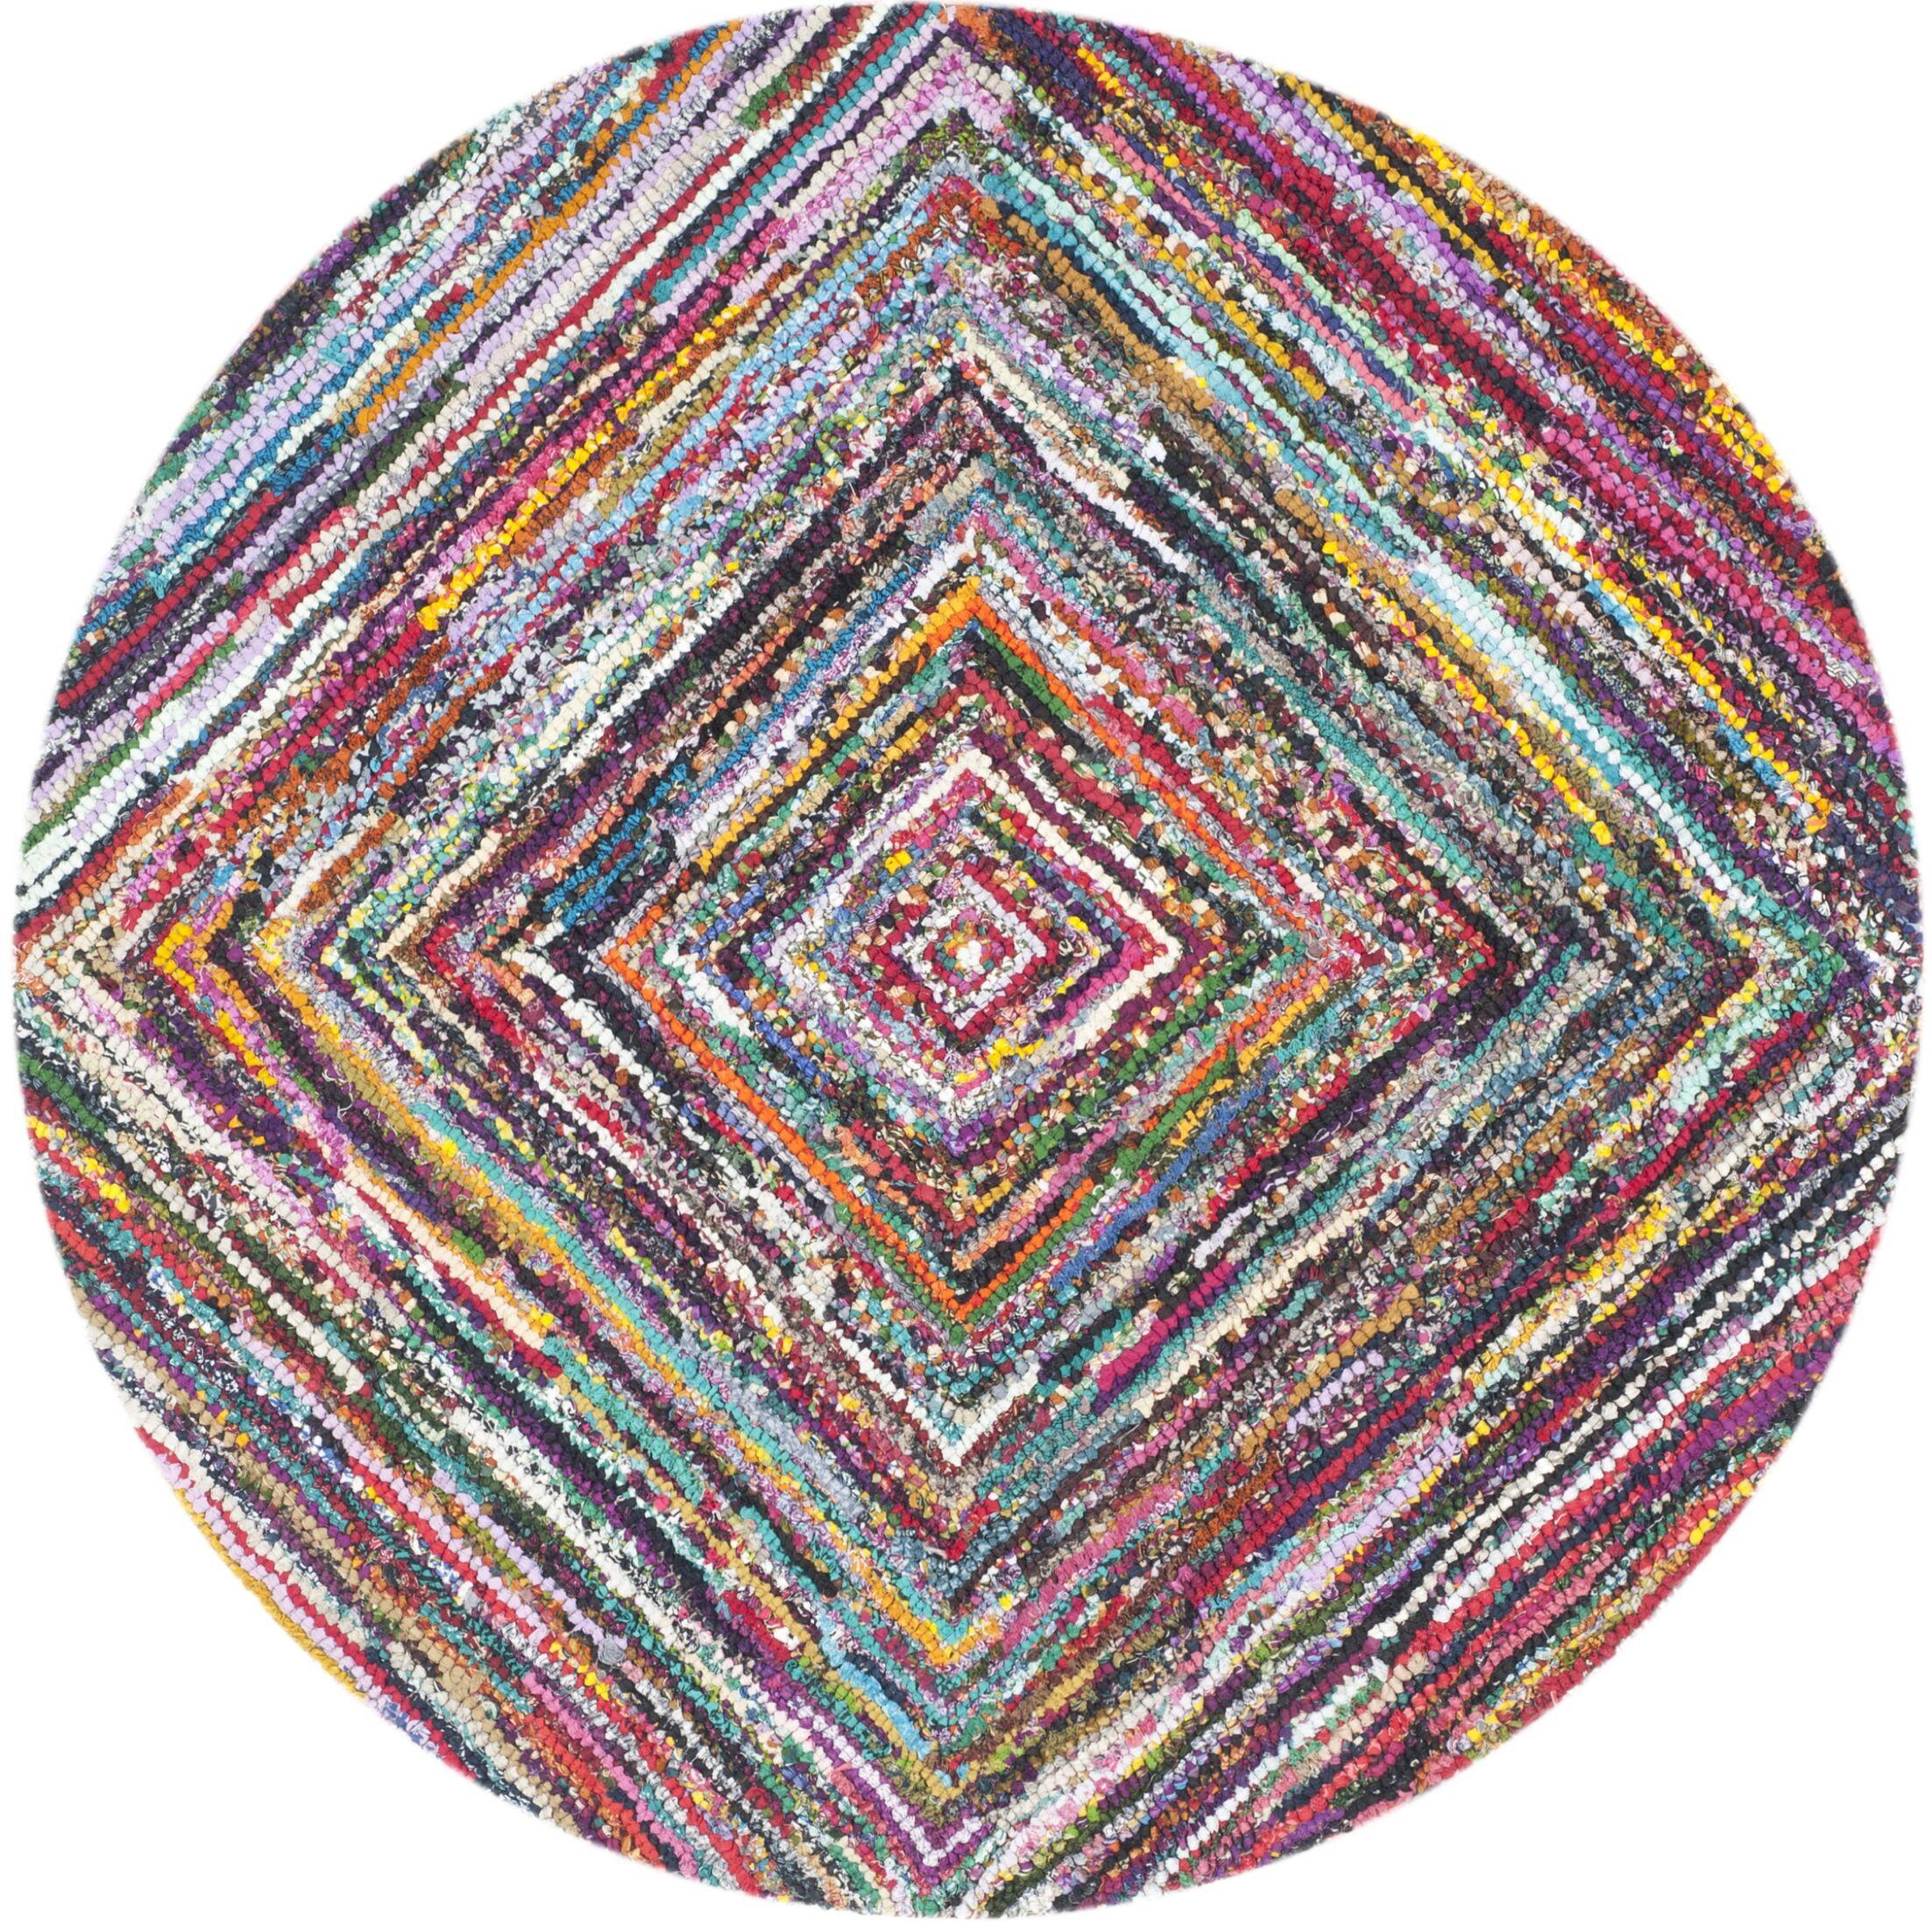 Anaheim Hand-Tufted Area Rug Rug Size: Rectangle 8' x 10'